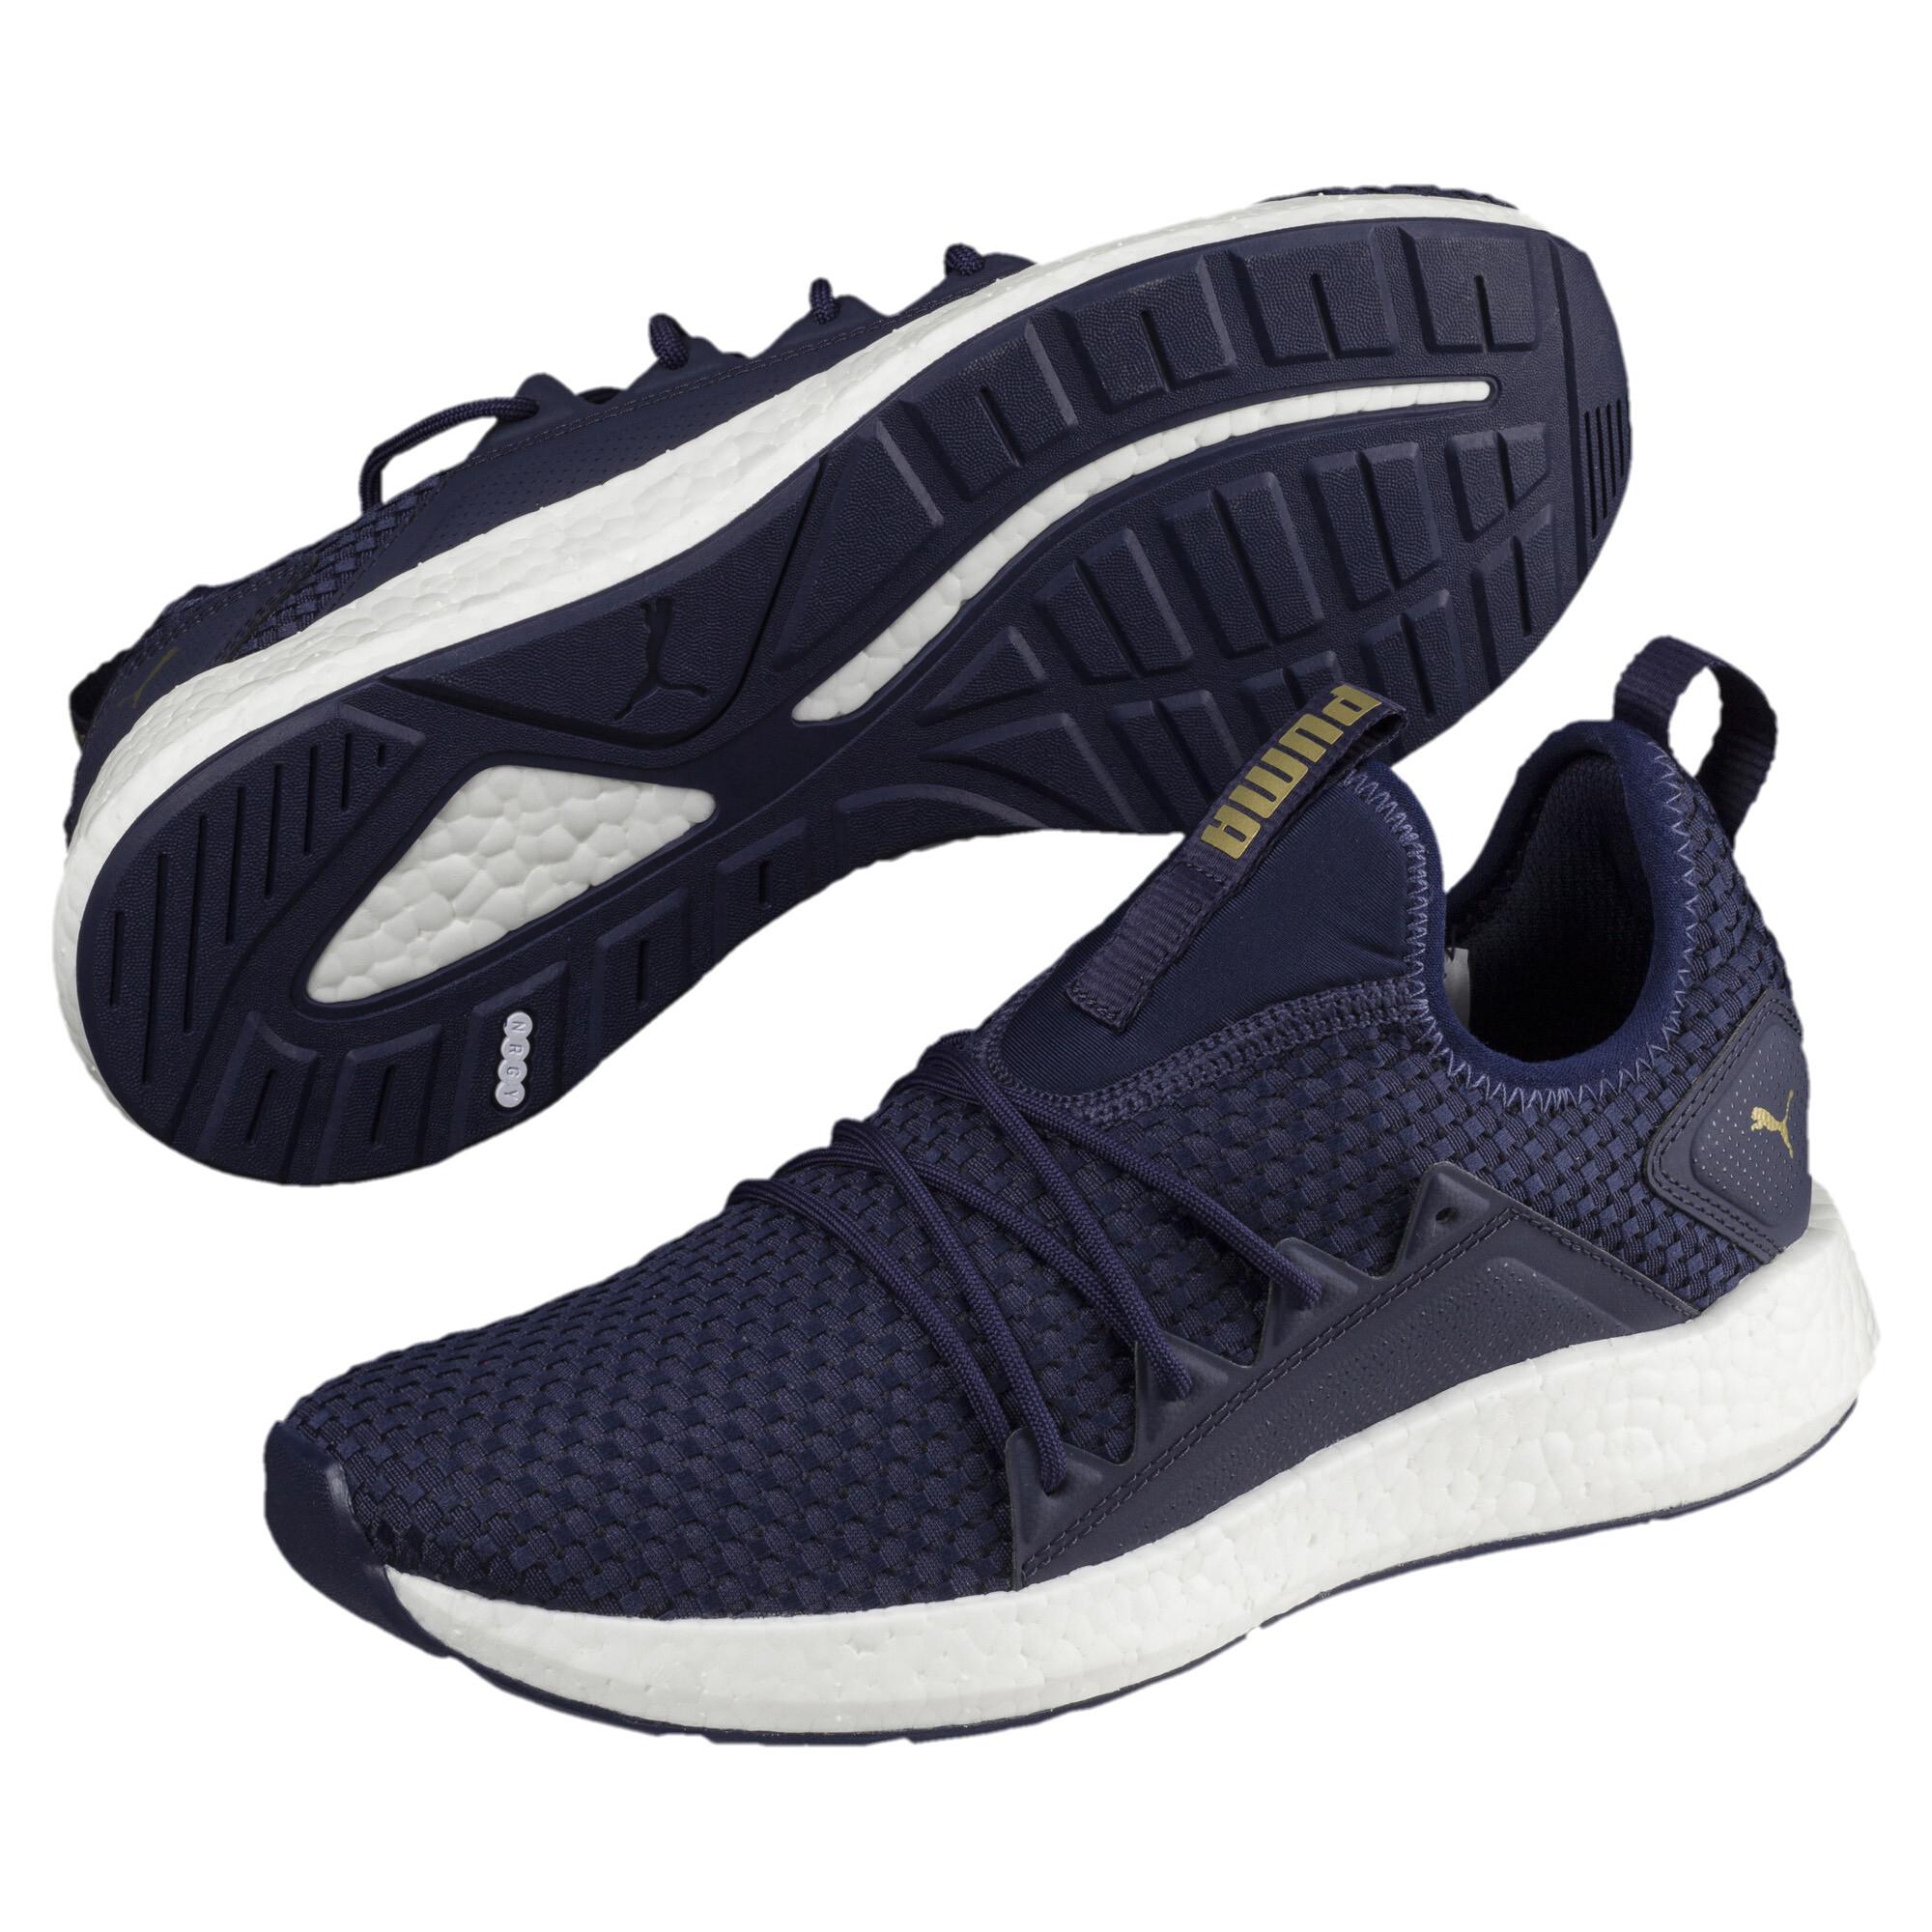 wholesale dealer f625b 03ec5 PUMA-NRGY-Neko-VT-Wns-Women-Shoe-Running thumbnail